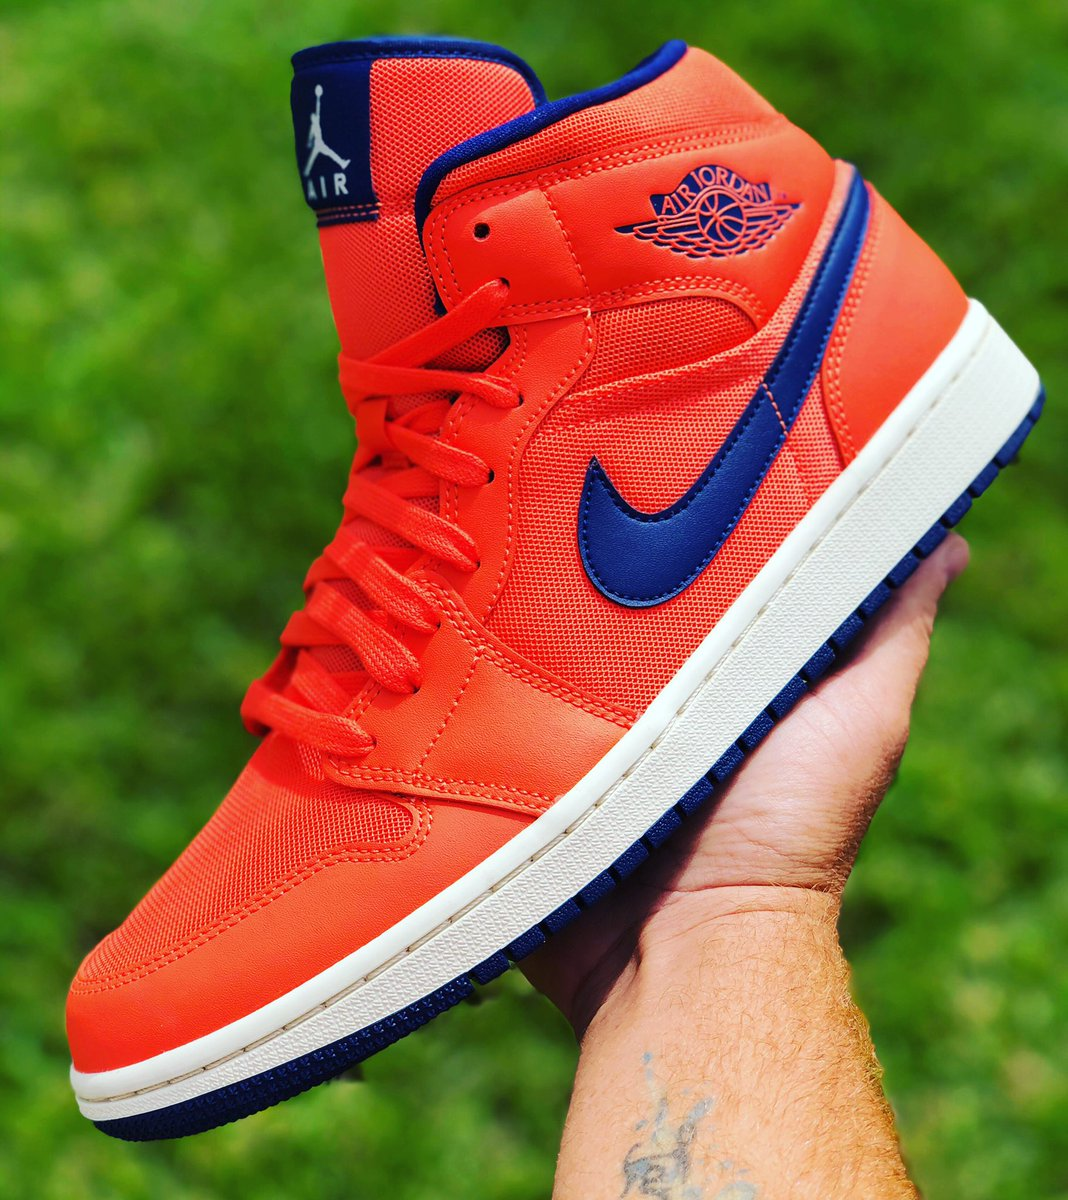 "Jordan 1 ""Turf Orange and blue"" Ds Og all Size 10M Link in Bio‼️ ☢️☢️☢️☢️☢️☢️☢️☢️☢️☢️☢️☢️☢️☢️☢️☢️ #sneakerhead #sneakergallery #sneaker #yeezy #jordans #offwhite #nikeshoes #adidas #airmax #csworlds #airjordan #jordan1 #csworldkicks https://t.co/Wd8G8AI1jp"